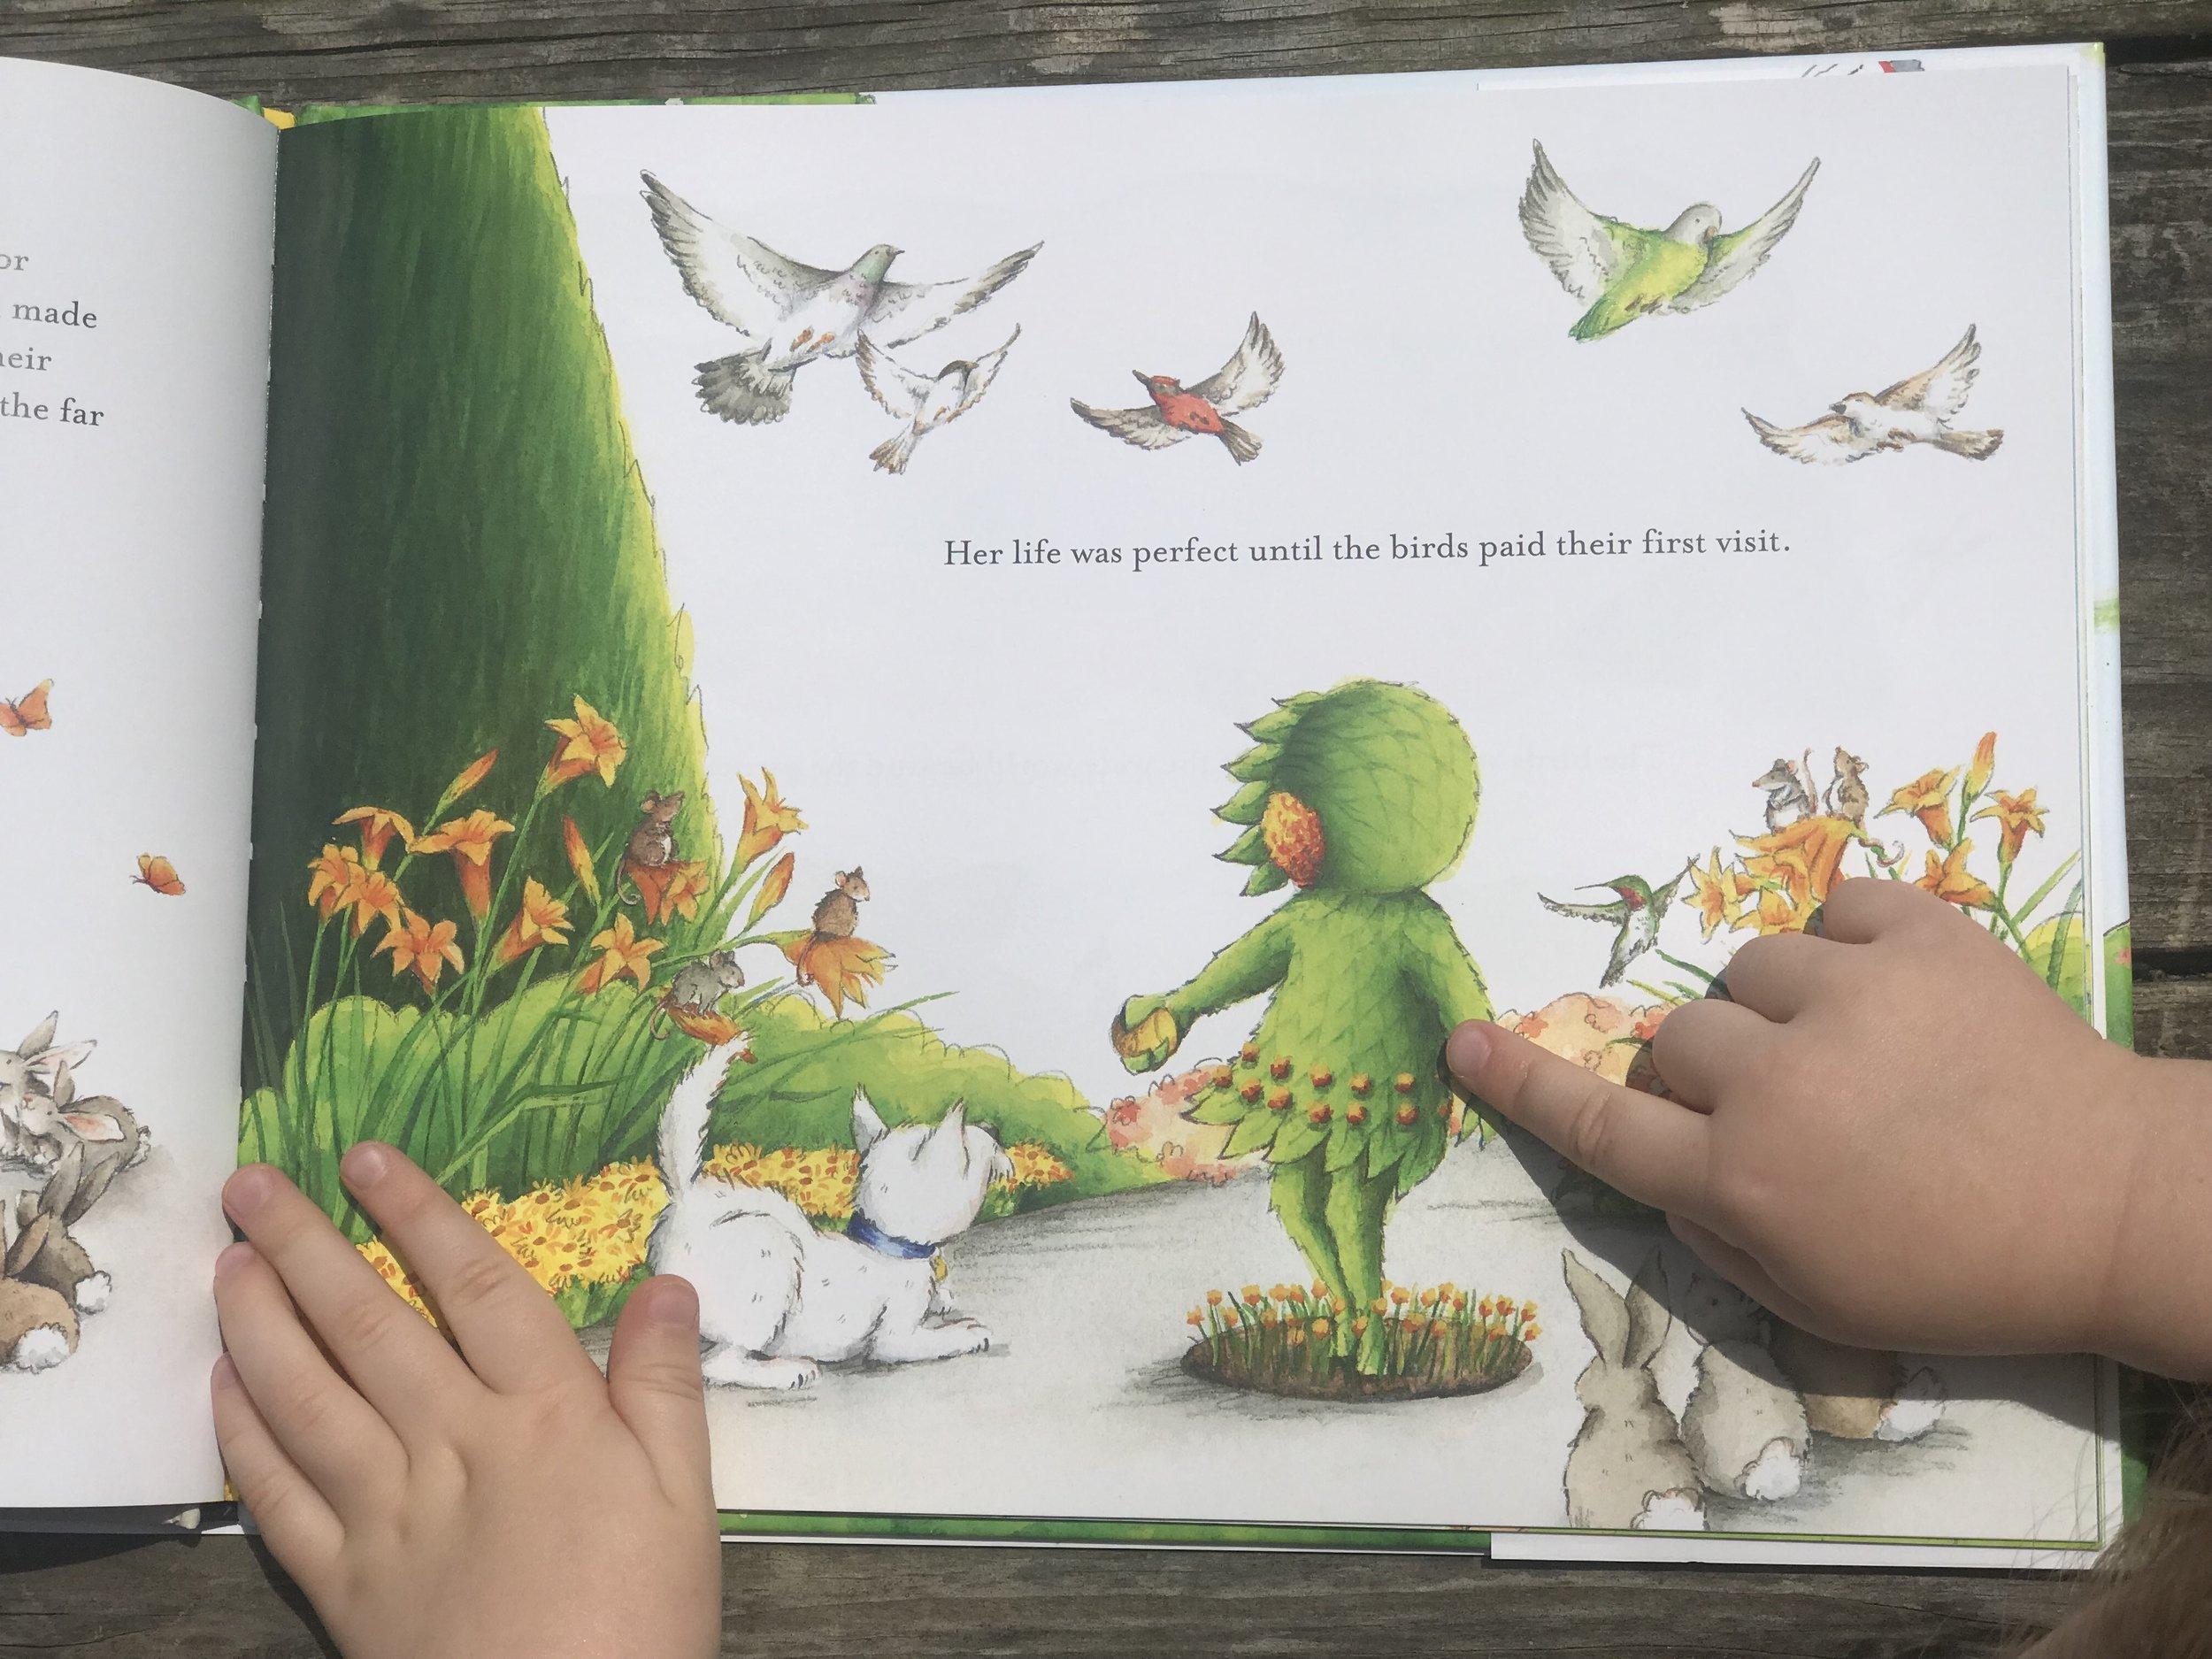 the little green girl lisa anchin teaching empathy to kids 2.jpeg